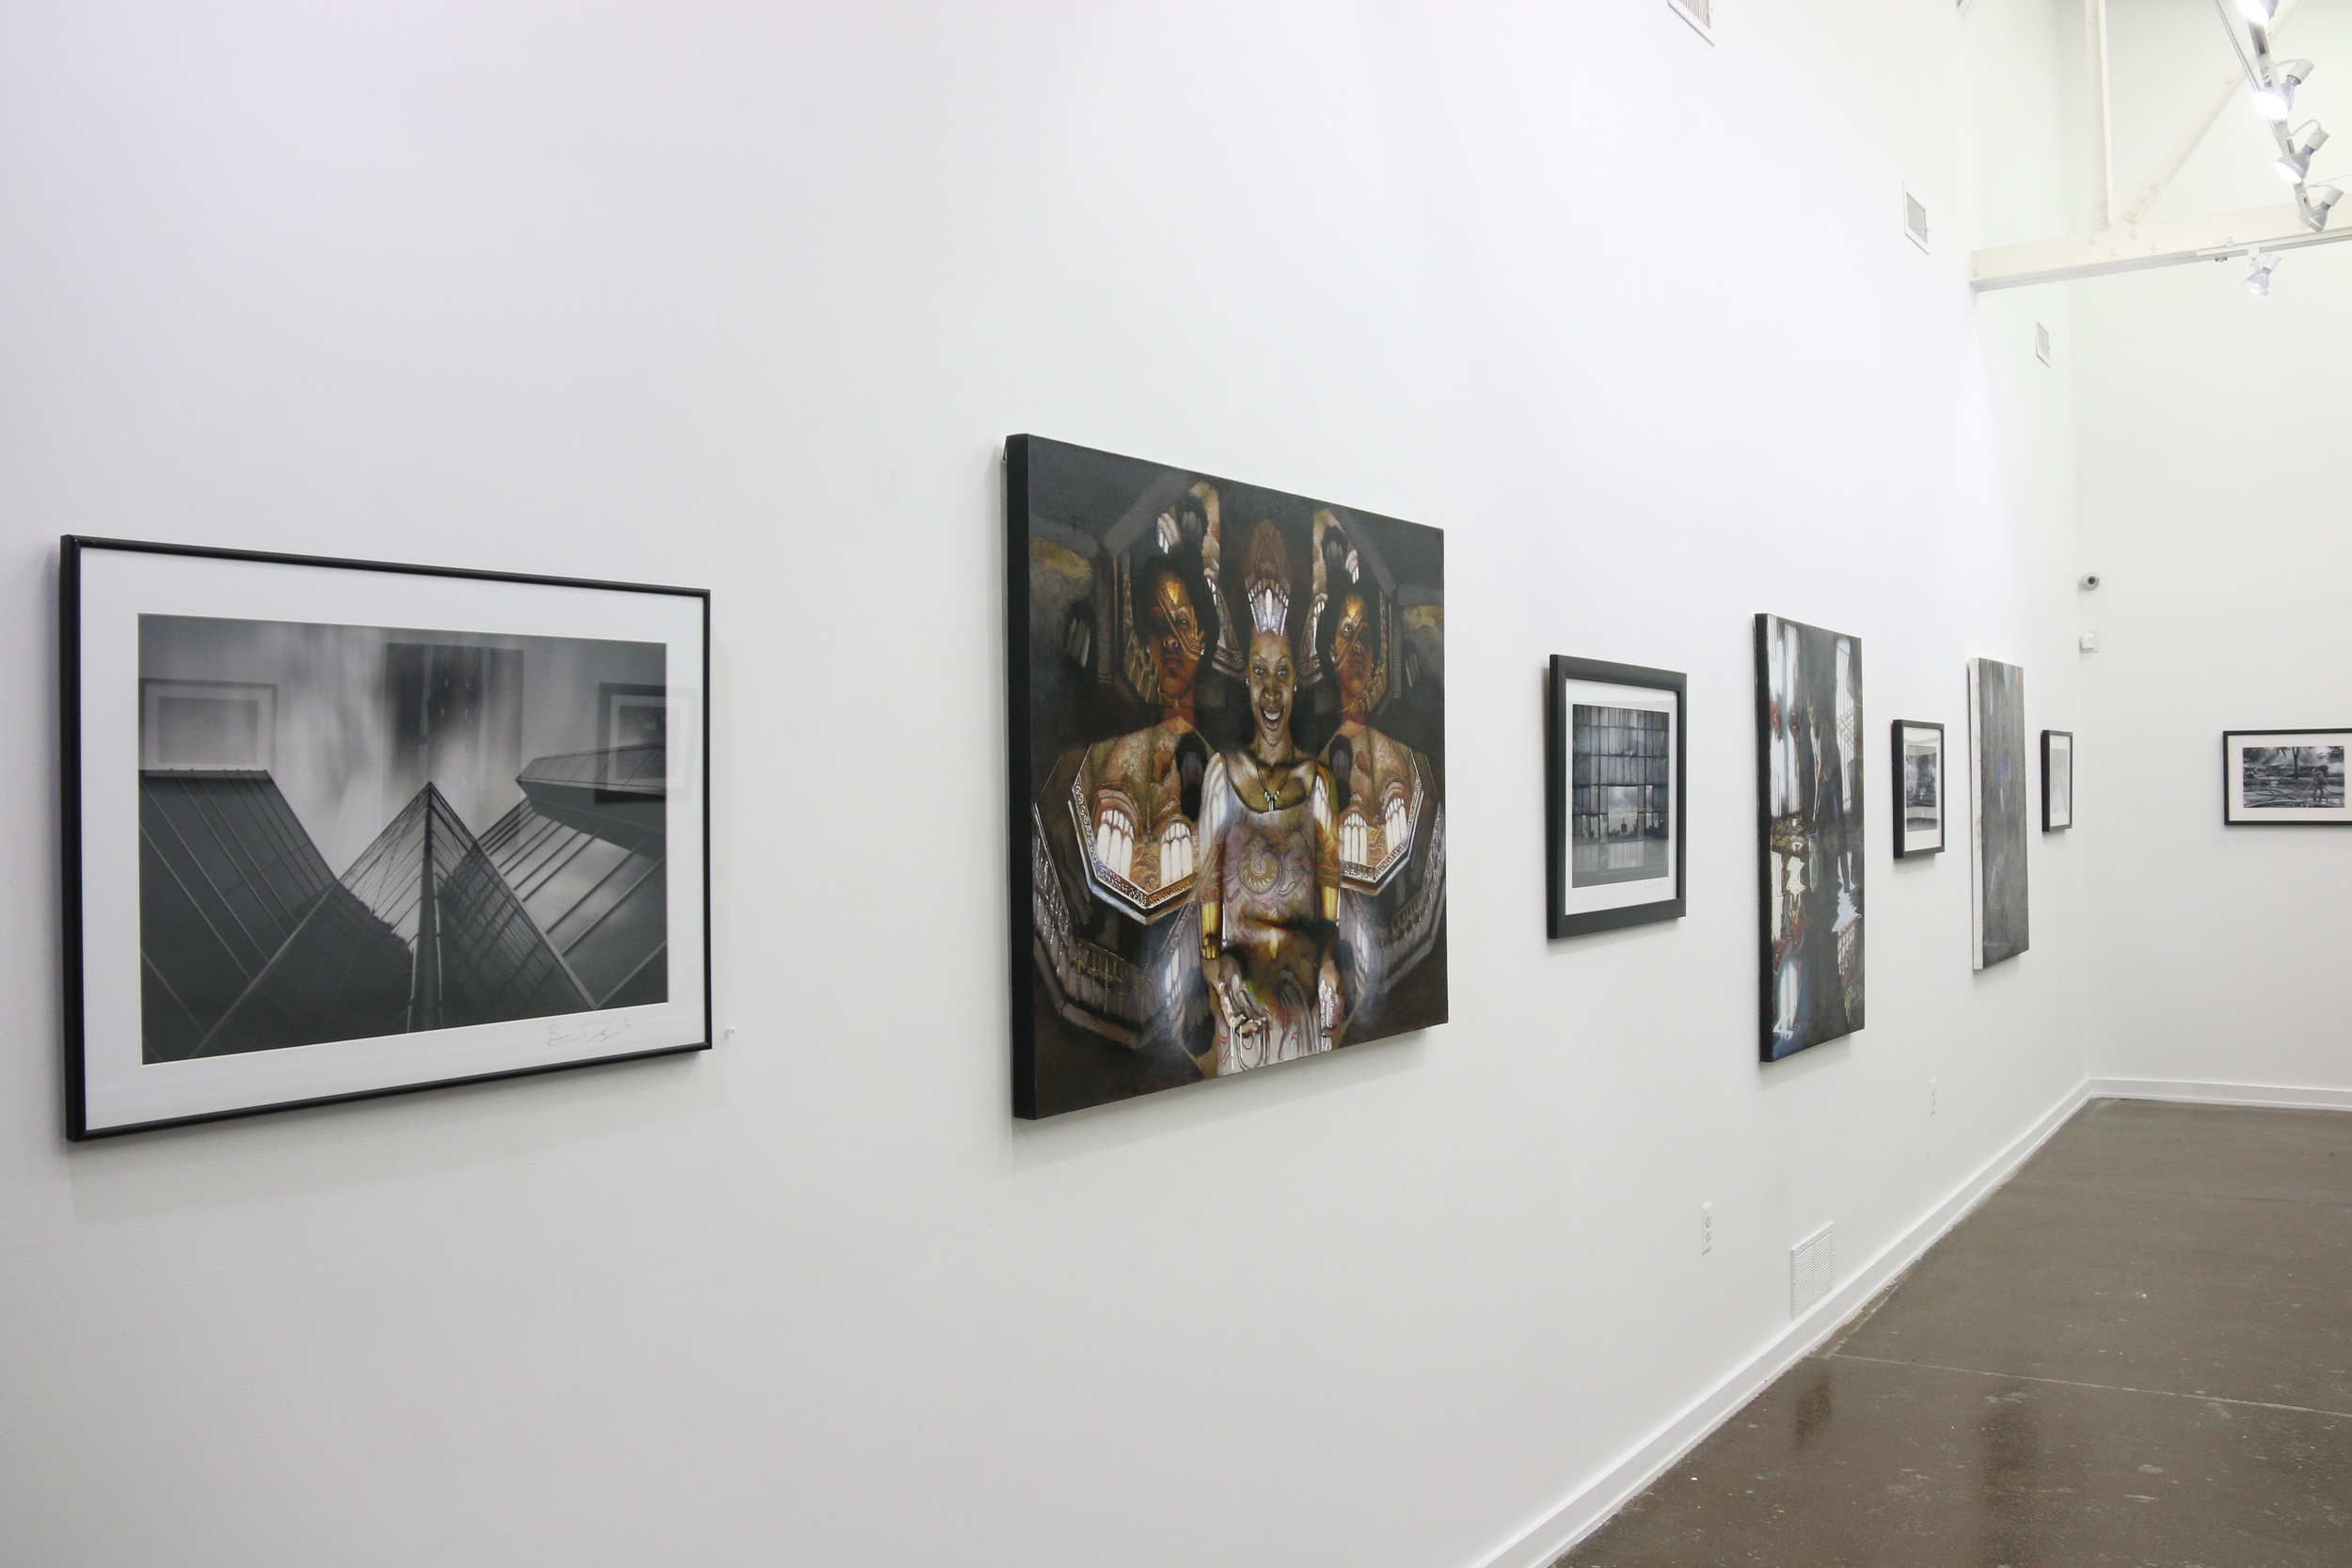 Galerie Camille Install-7.jpg